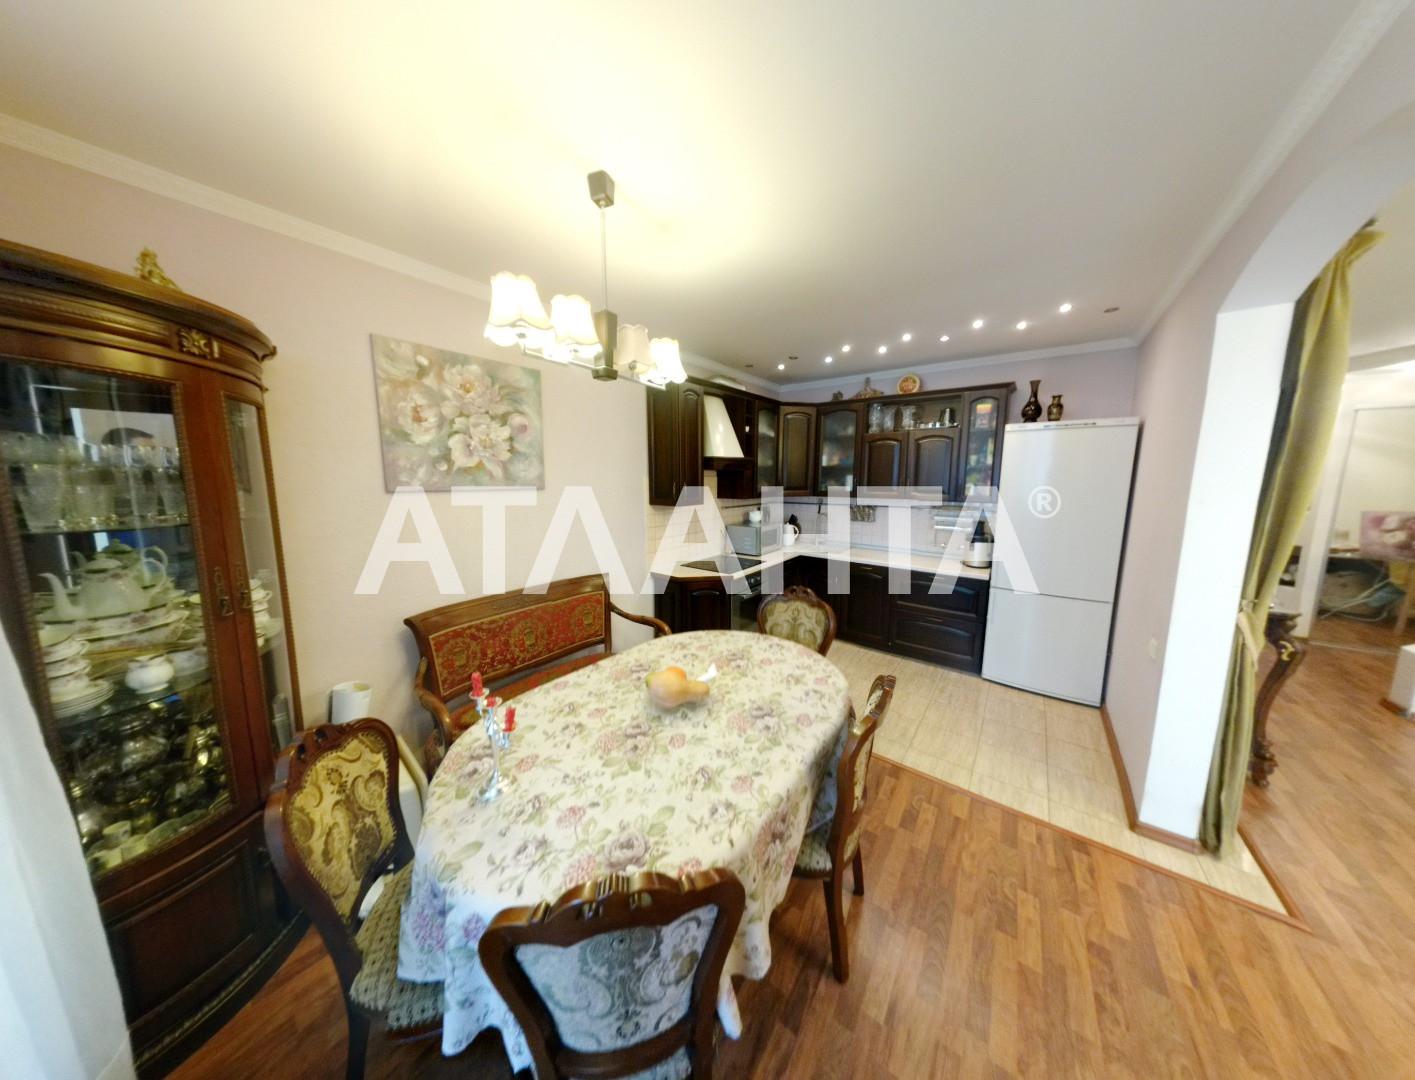 Продается 3-комнатная Квартира на ул. Ул. Ломоносова — 139 600 у.е. (фото №6)